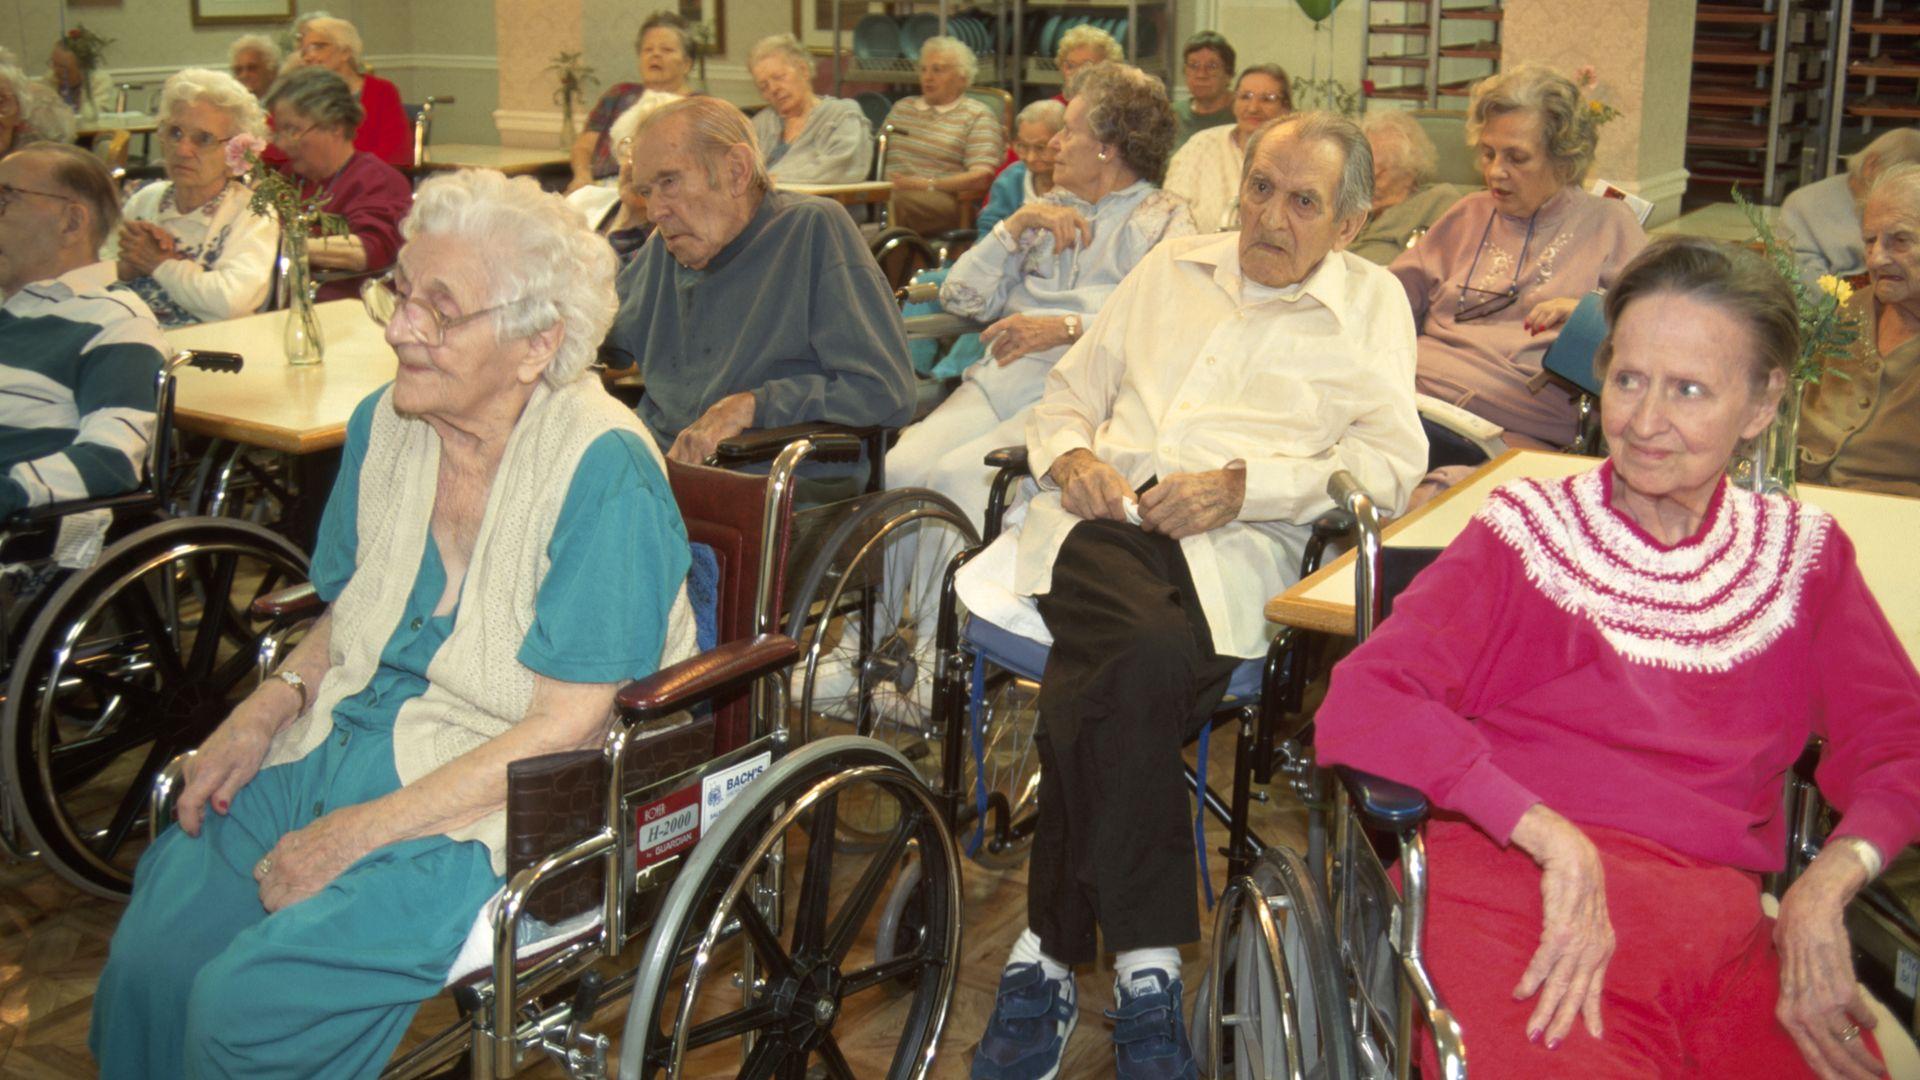 New Jersey, Morristown, nursing home residents